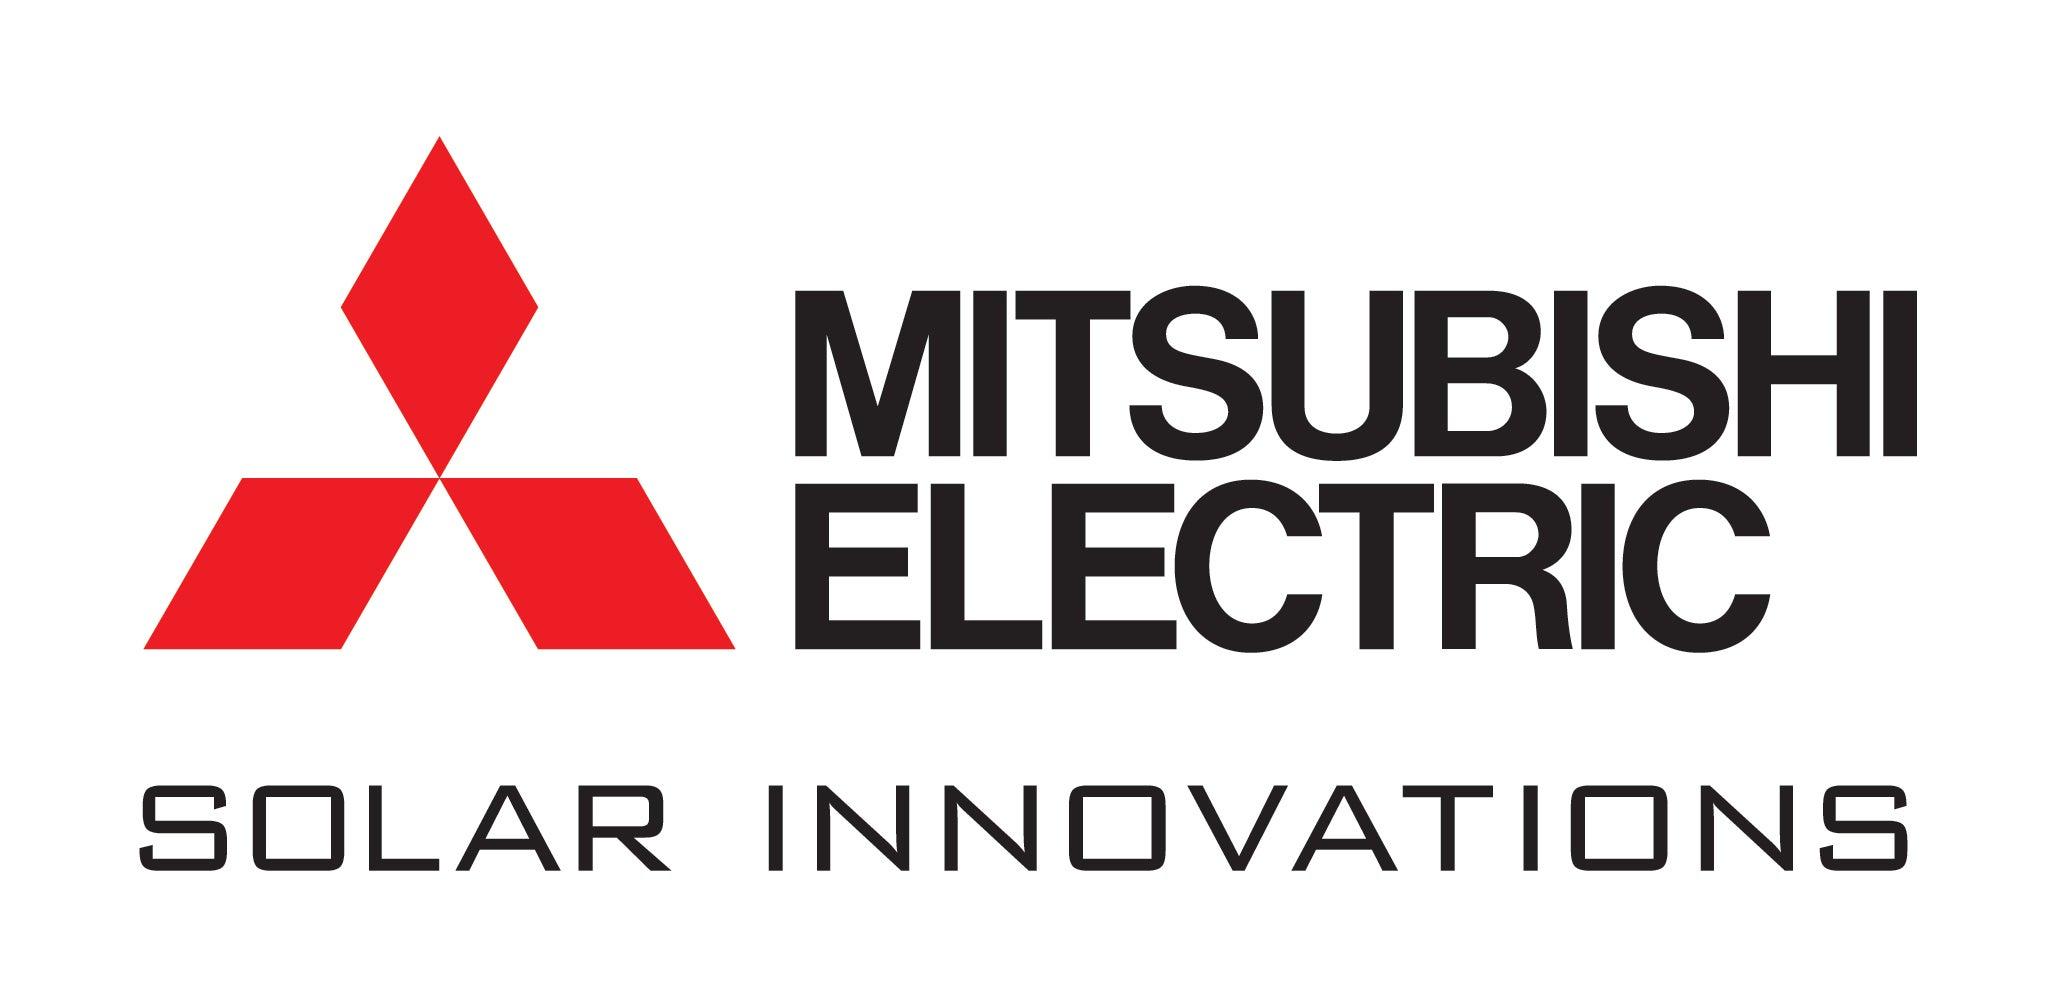 Vivint solar reviews california - Mitsubishi Electric Solar Panels Solar Company Reviews In 90630 Orange Cypress Ca